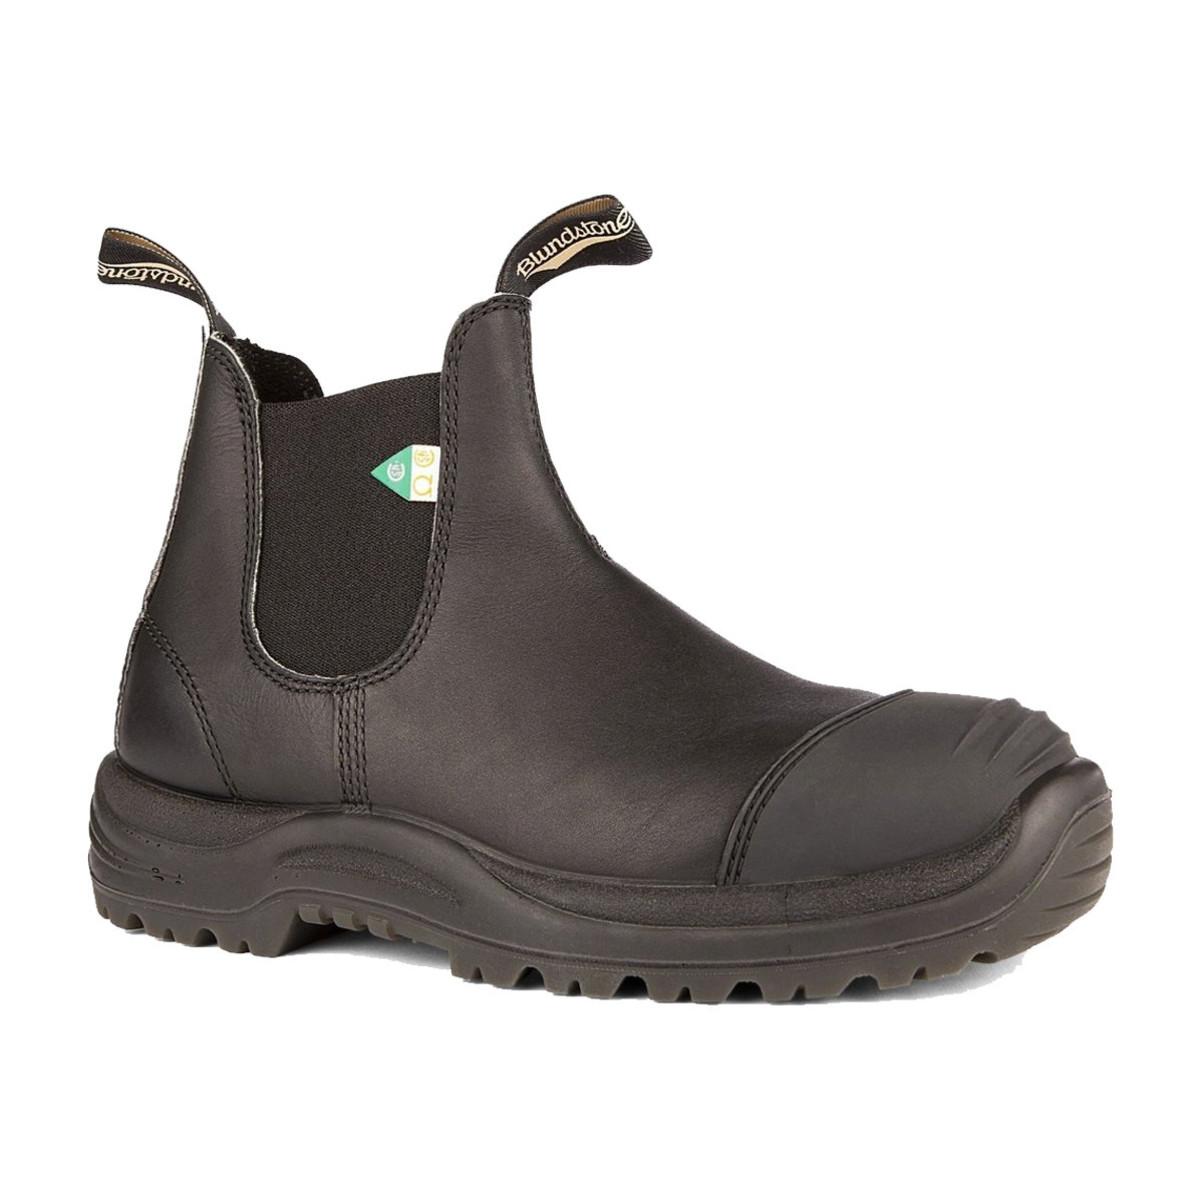 Blundstone 168 -  Work & Safety Rubber Toe Cap Black